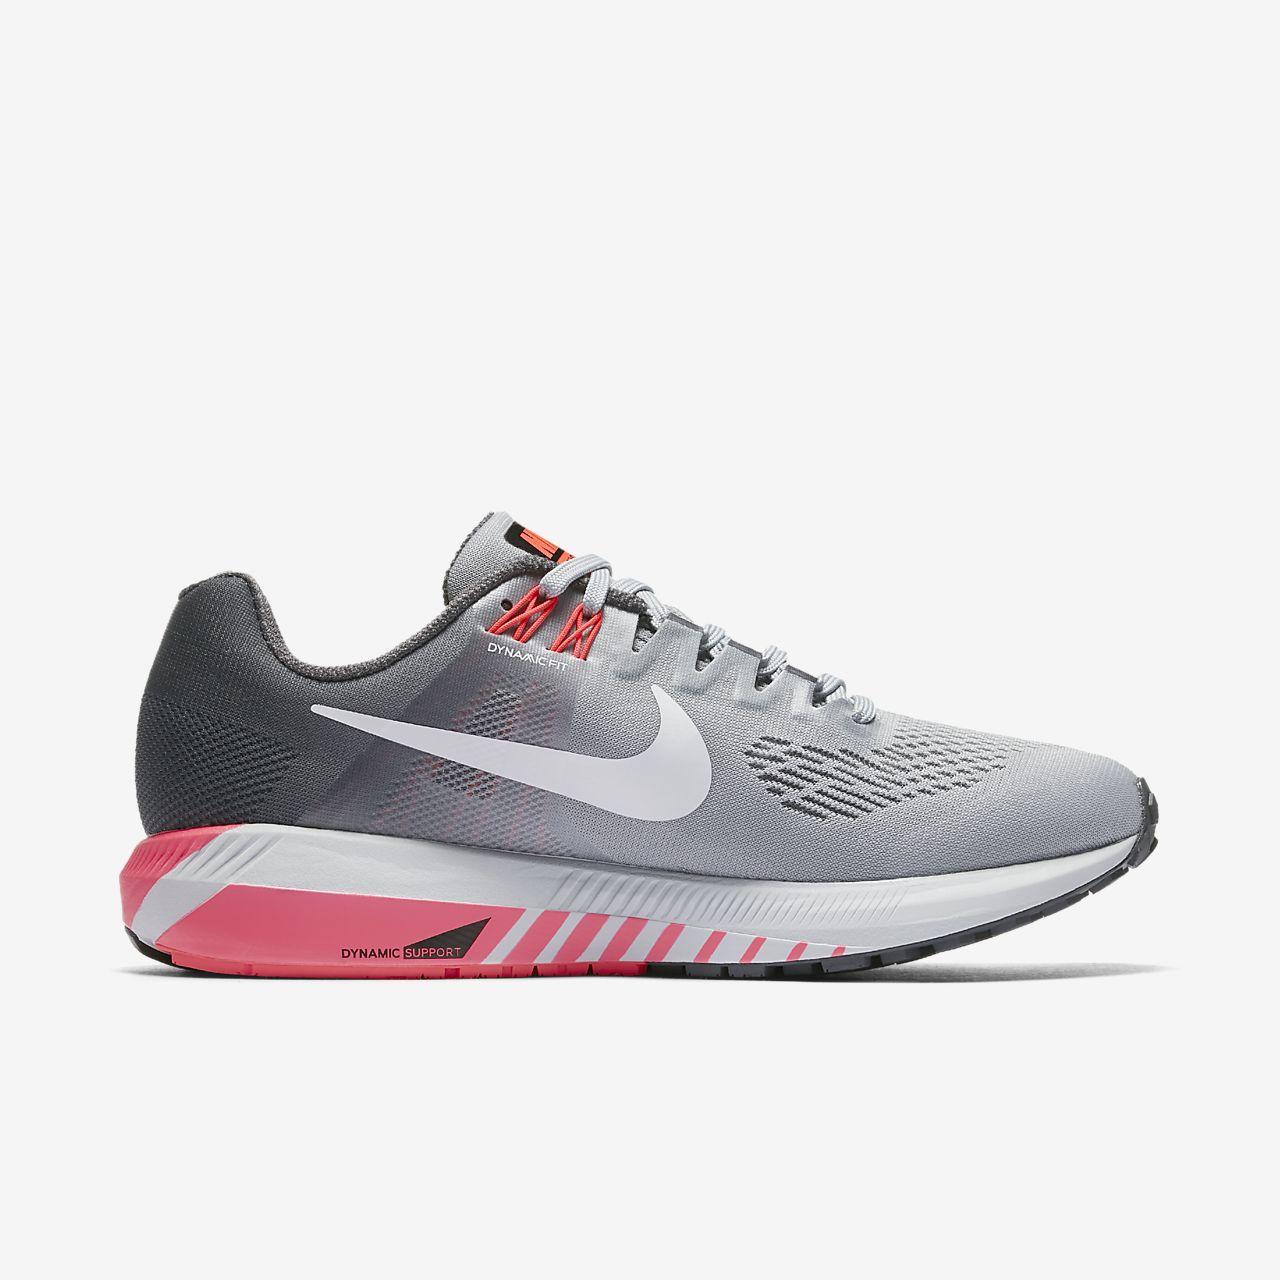 ... Nike Air Zoom Structure 21 Women's Running Shoe